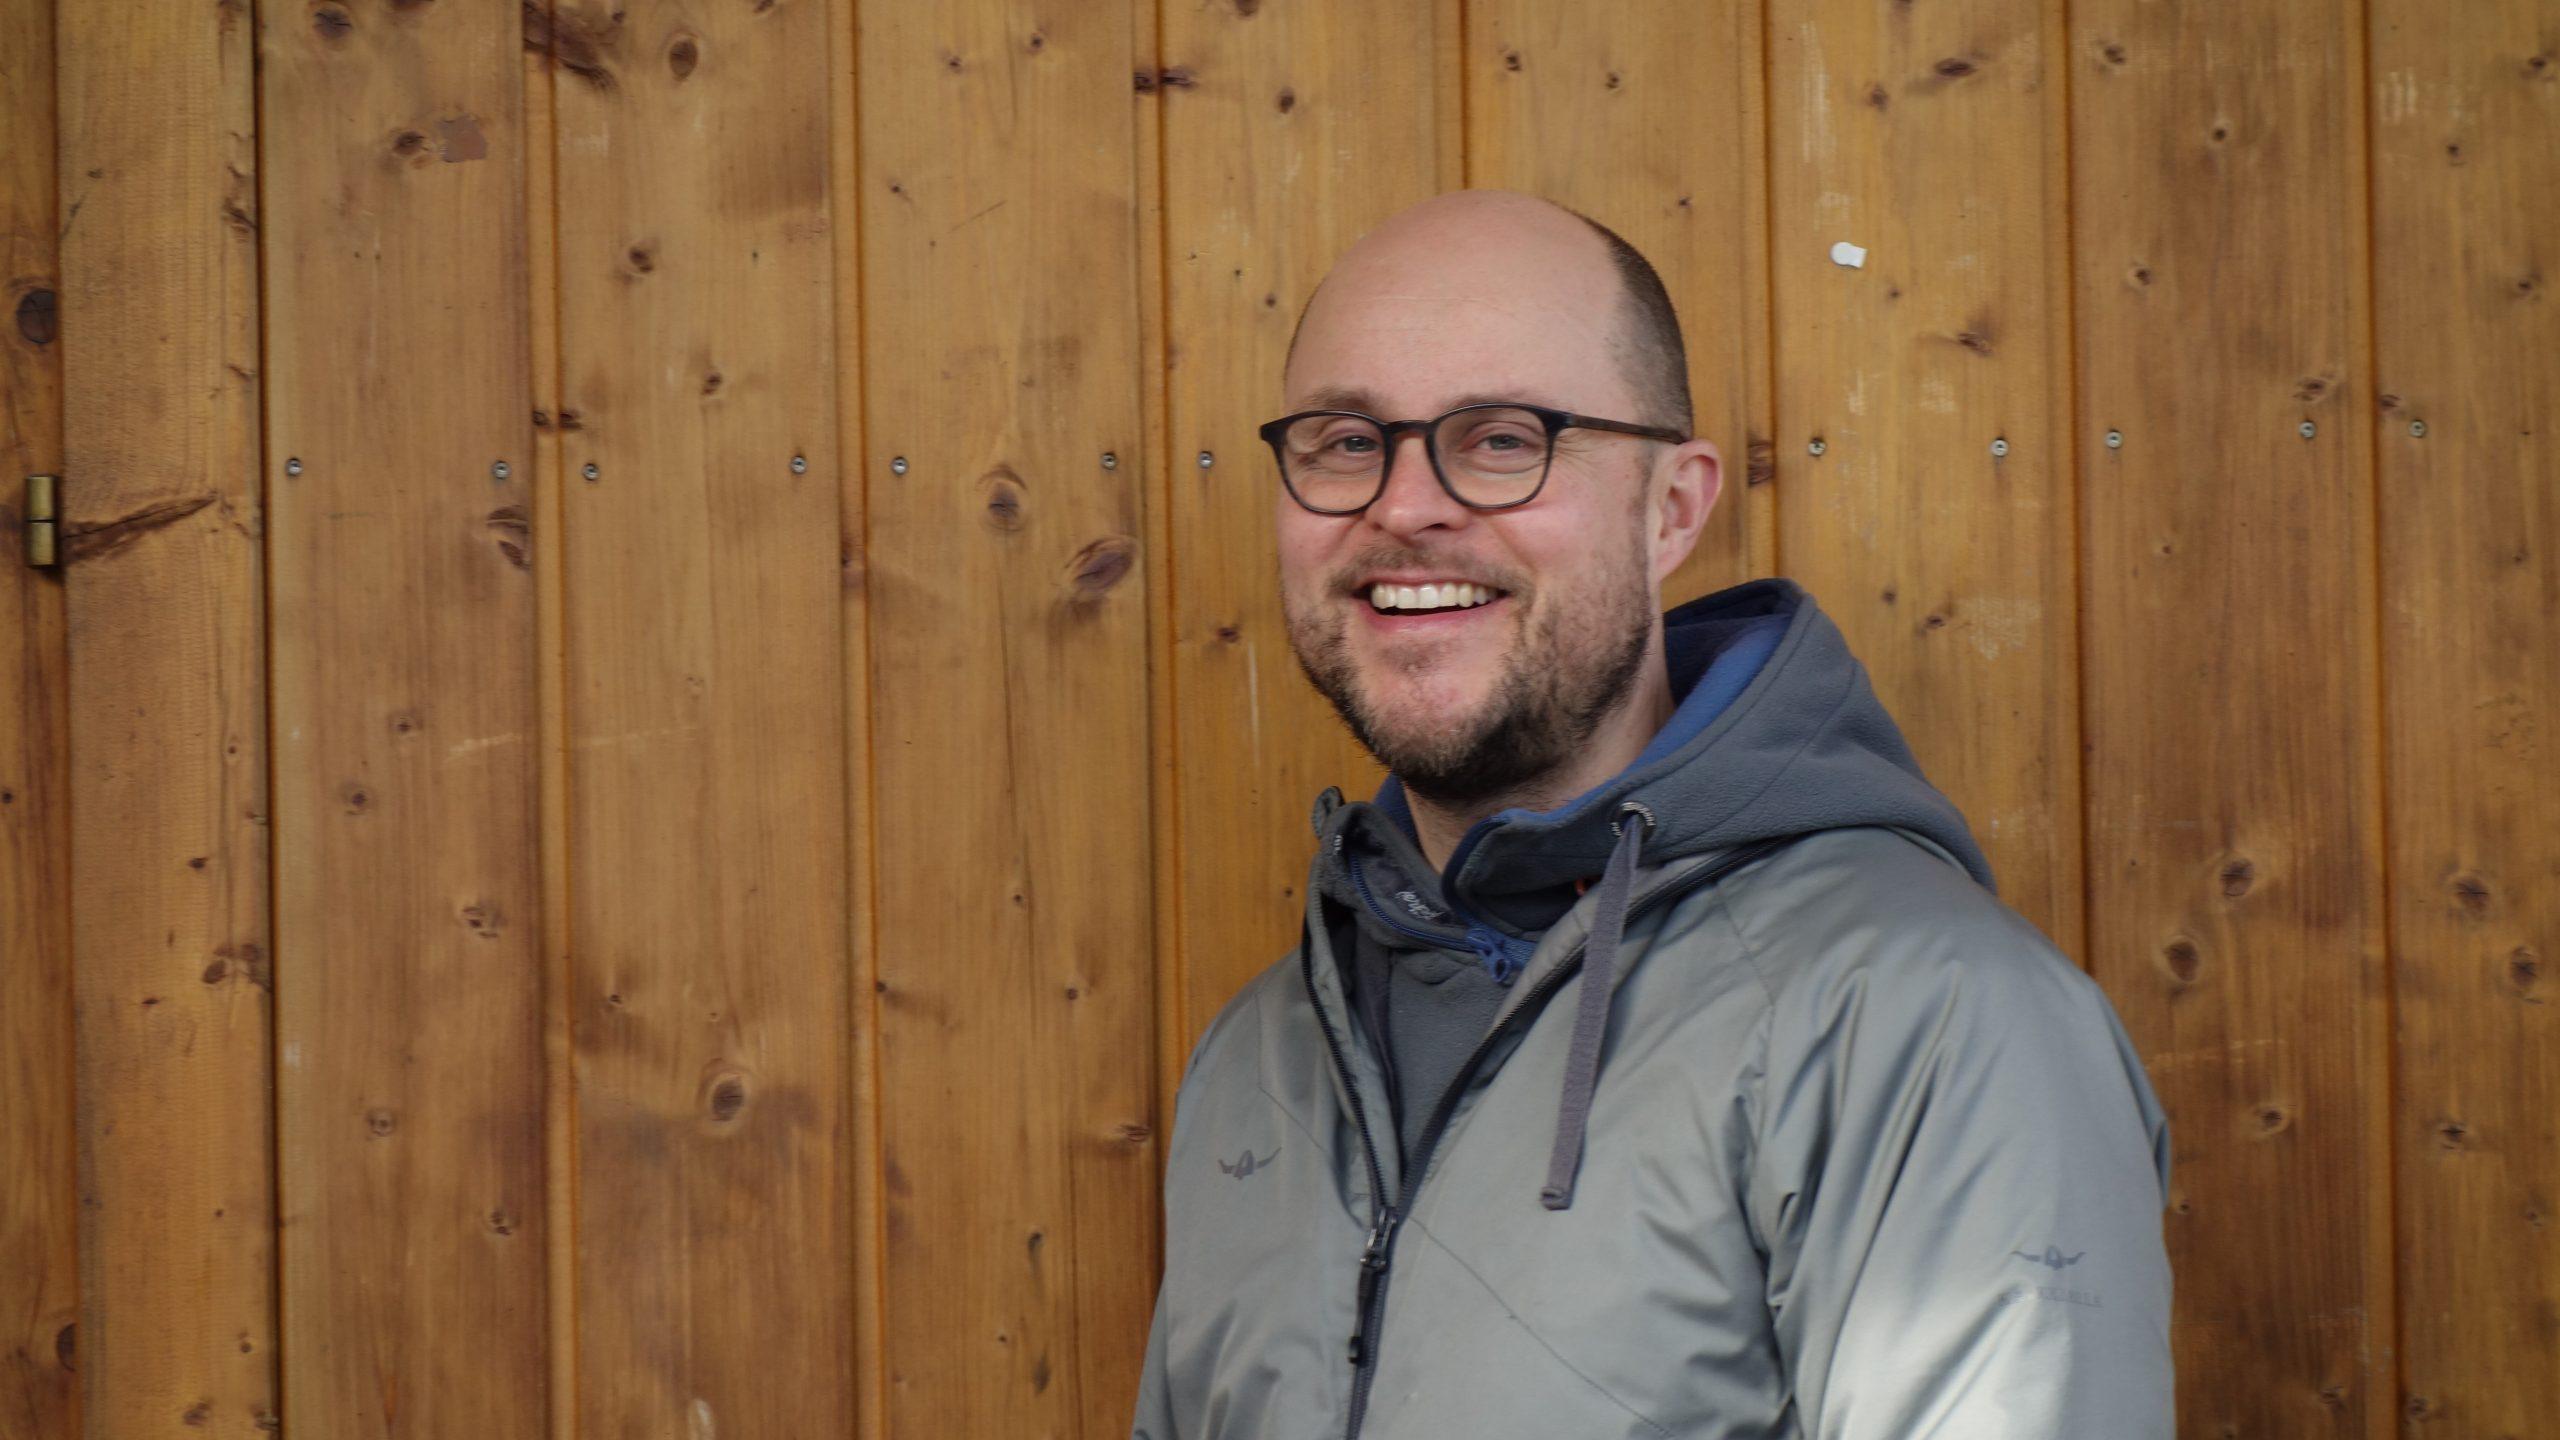 Florian_Neuhäuser-Portrait